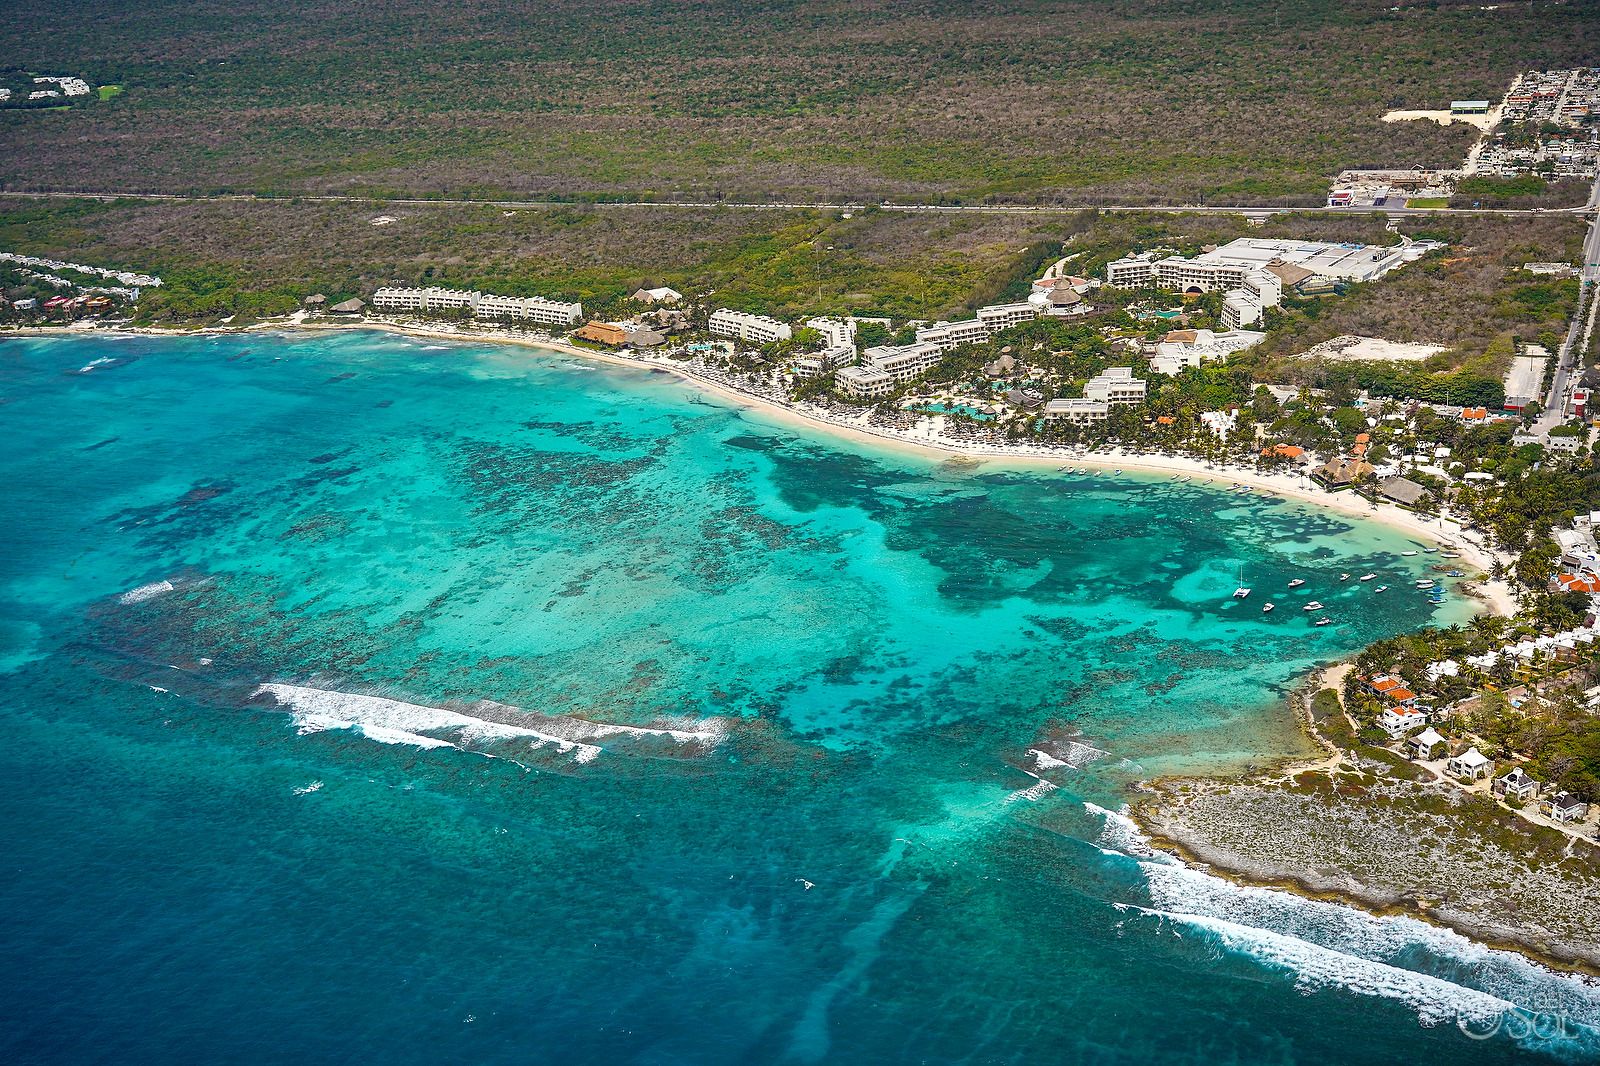 Akumal Bay Aerial Photography Quintana Roo - Covid 19